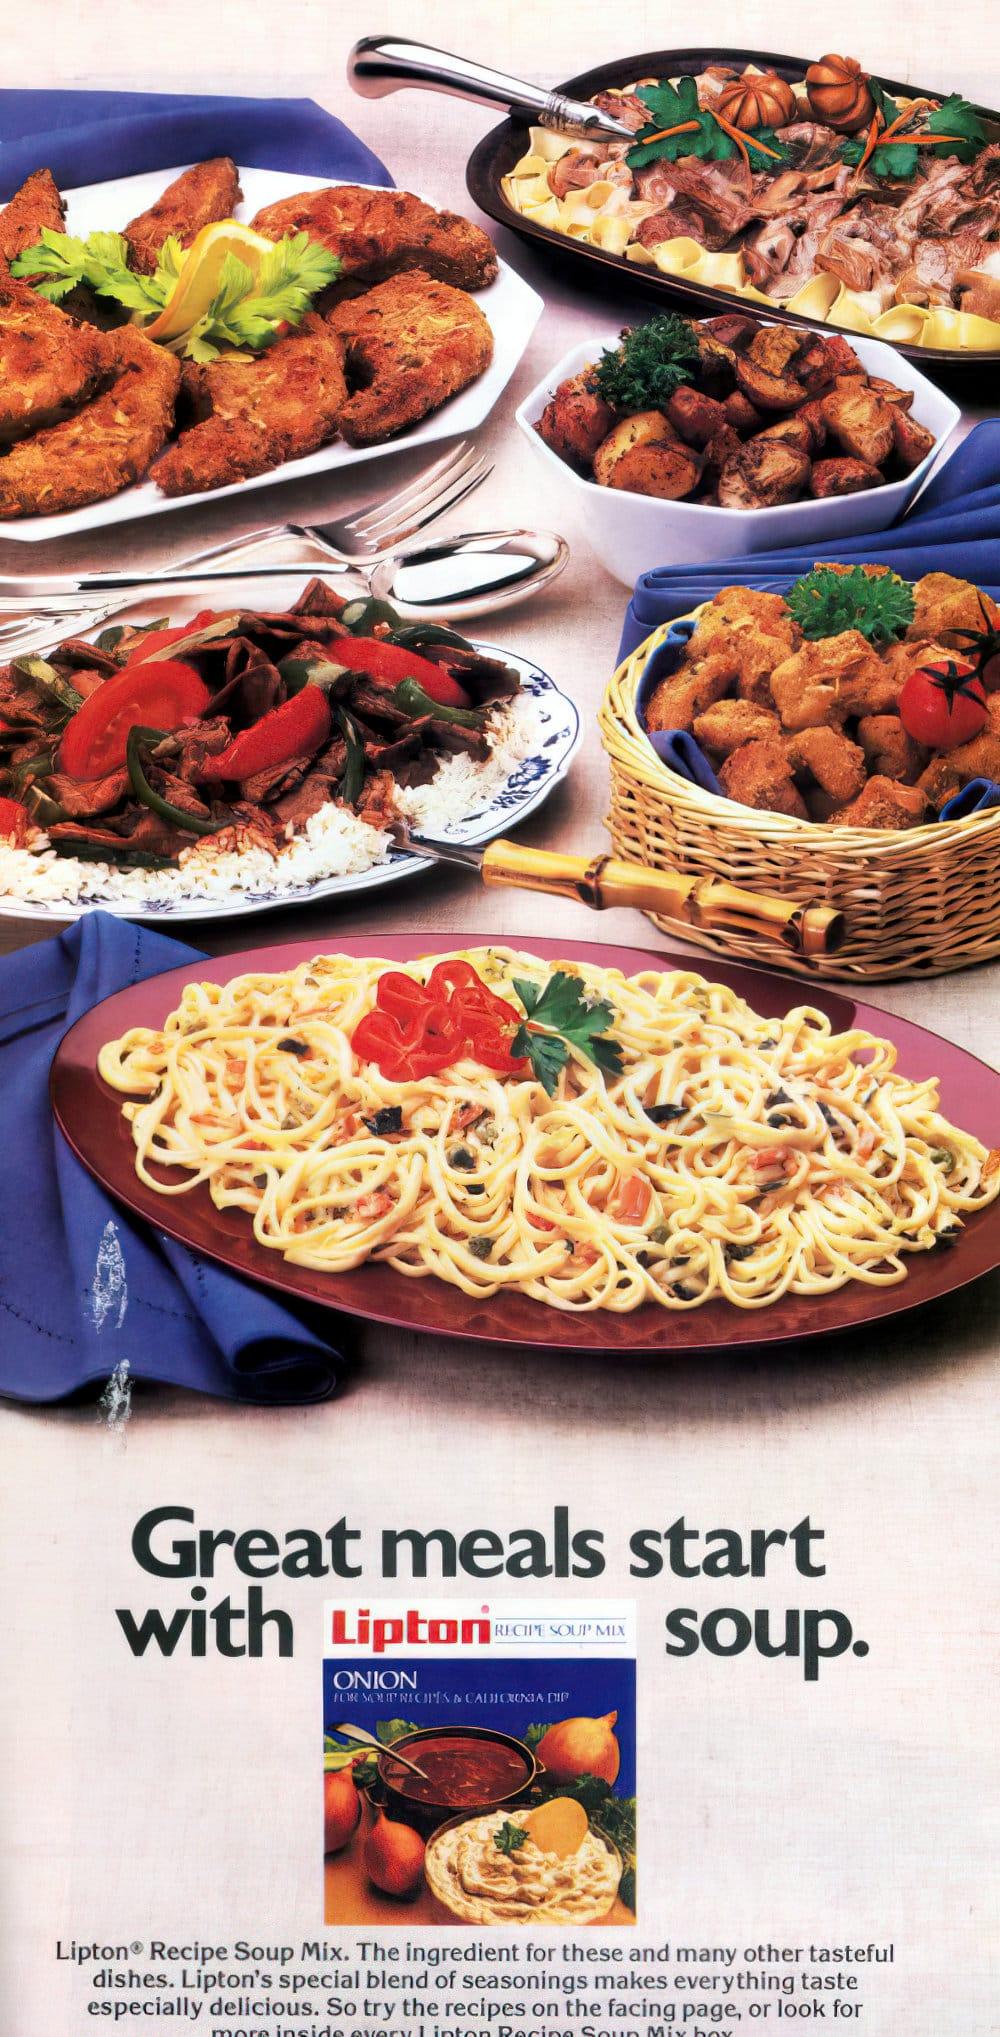 Chicken nuggets, primavera and beef stroganoff recipes (1987)